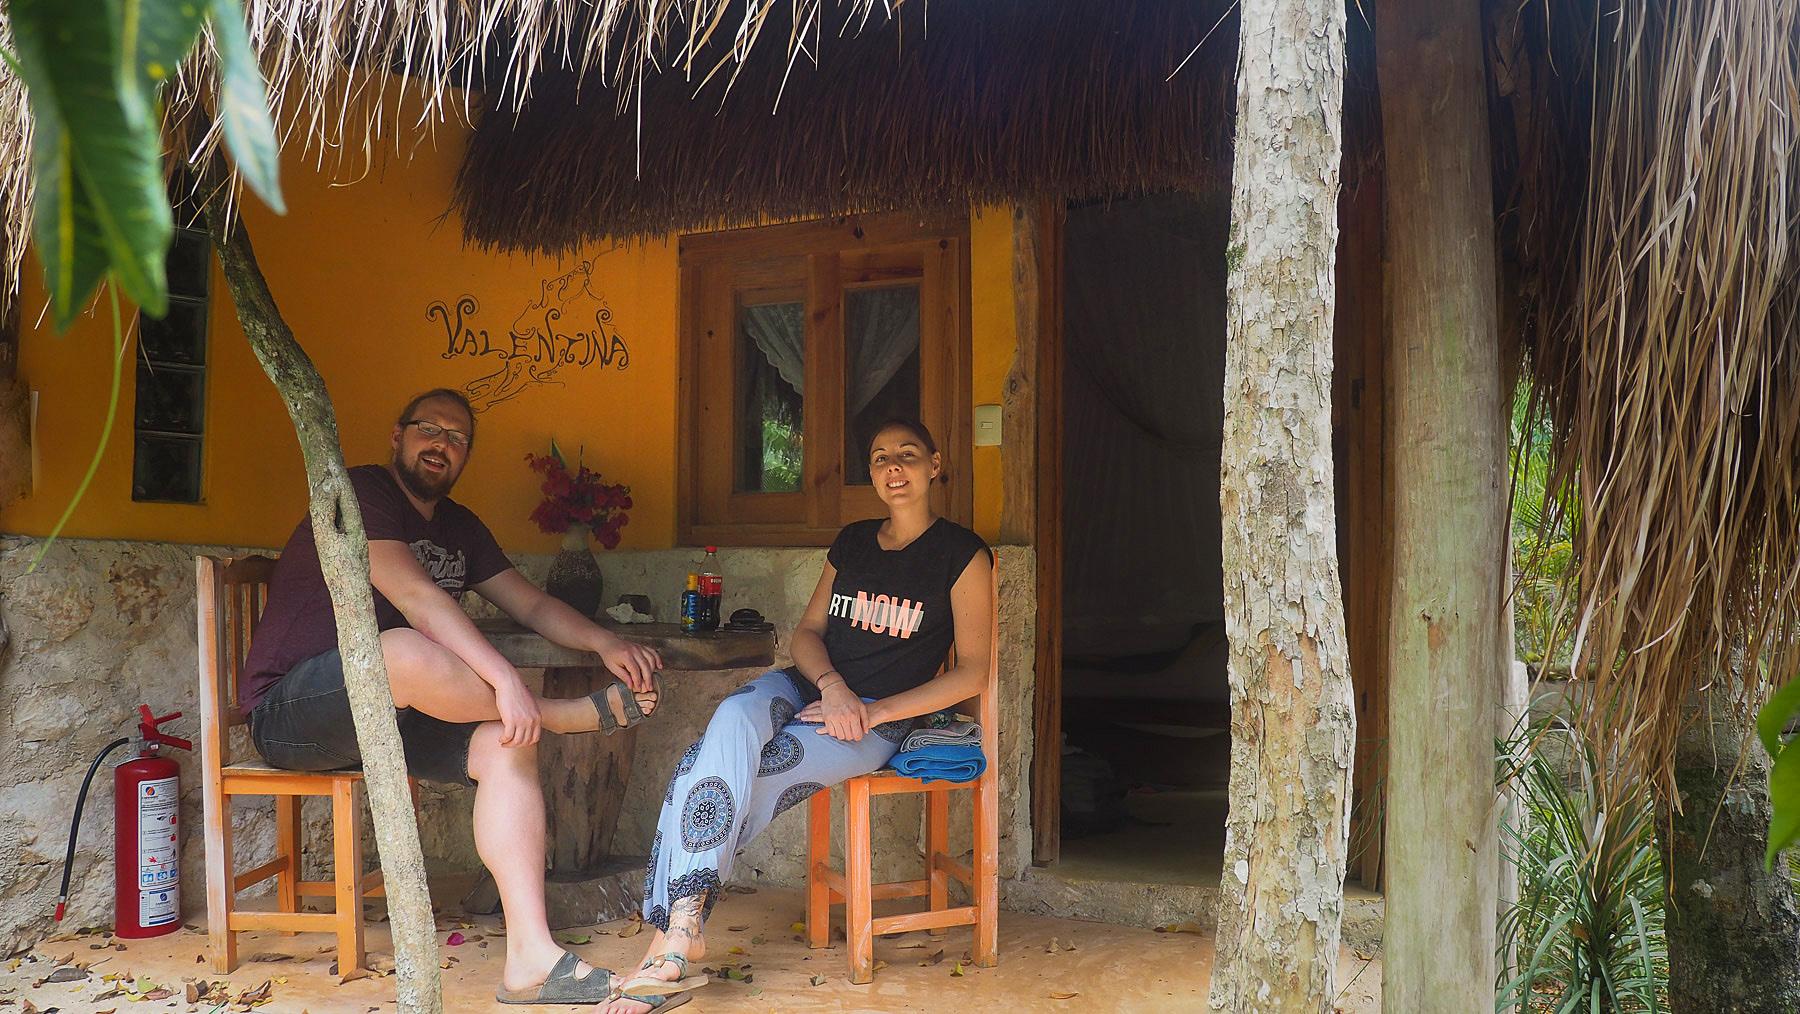 Nettes Ambiente im Casa Mango